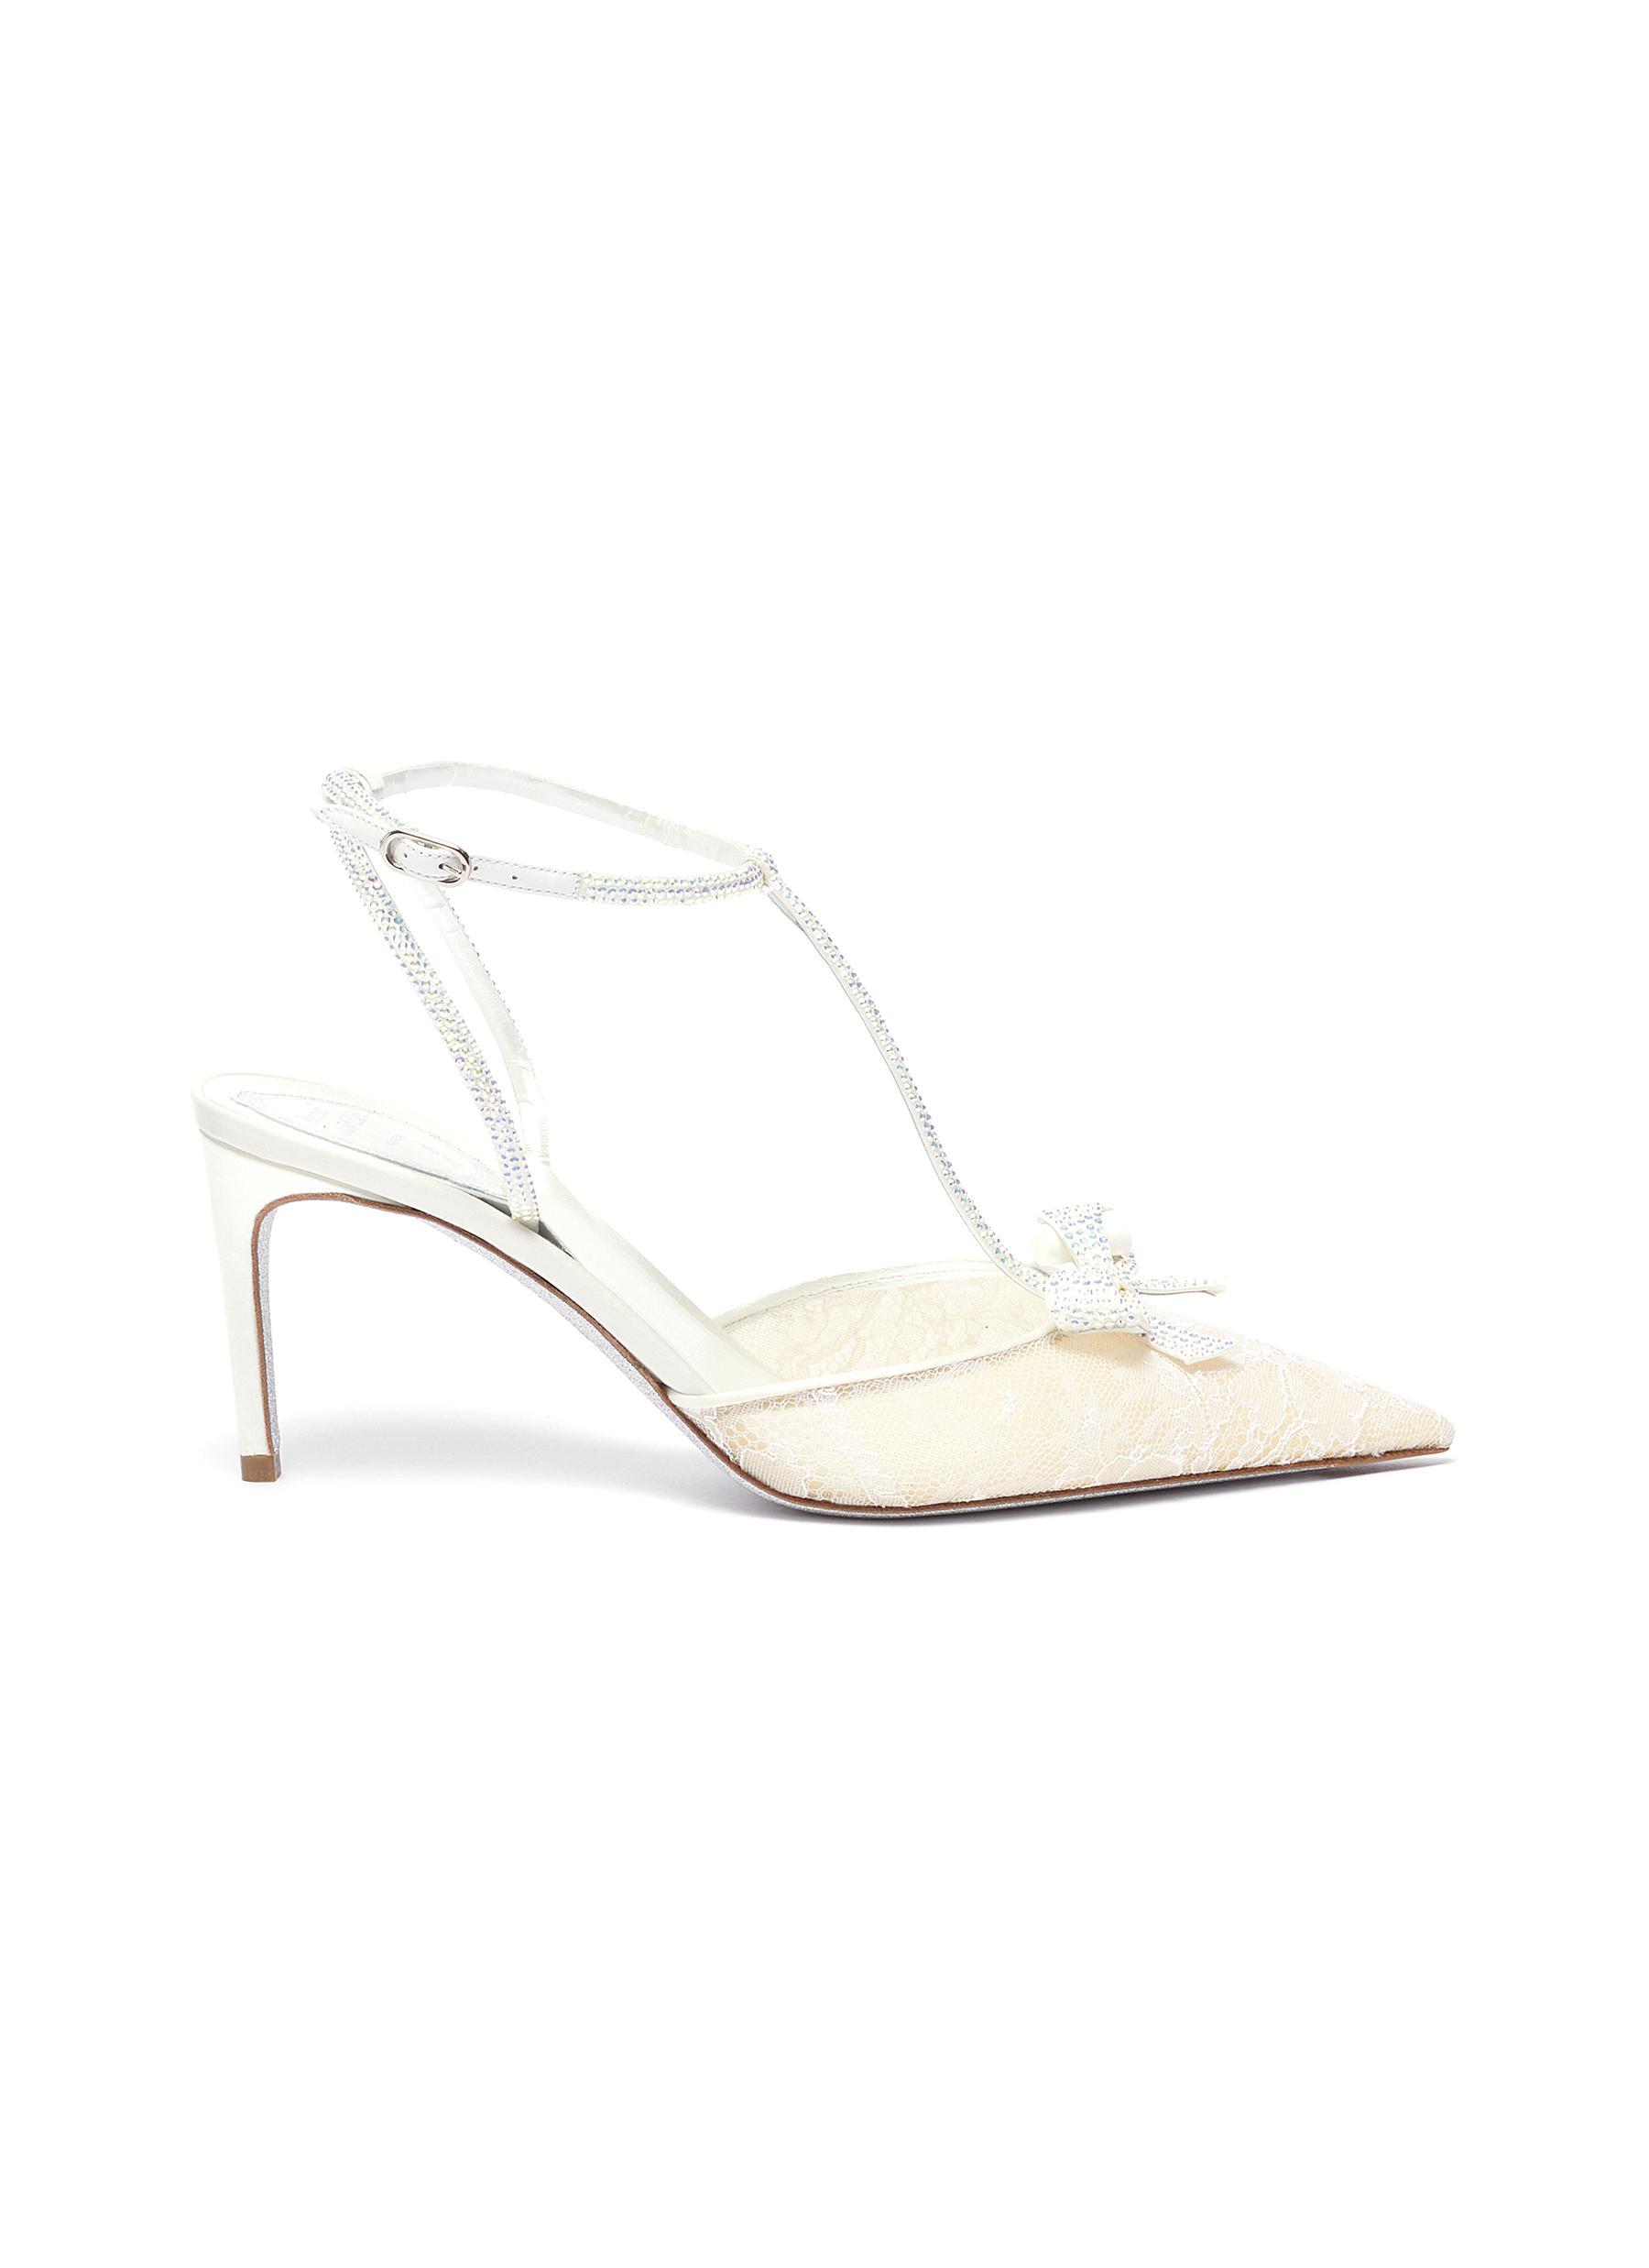 René Caovilla High Heels Strass lace satin t-strap slingback pumps